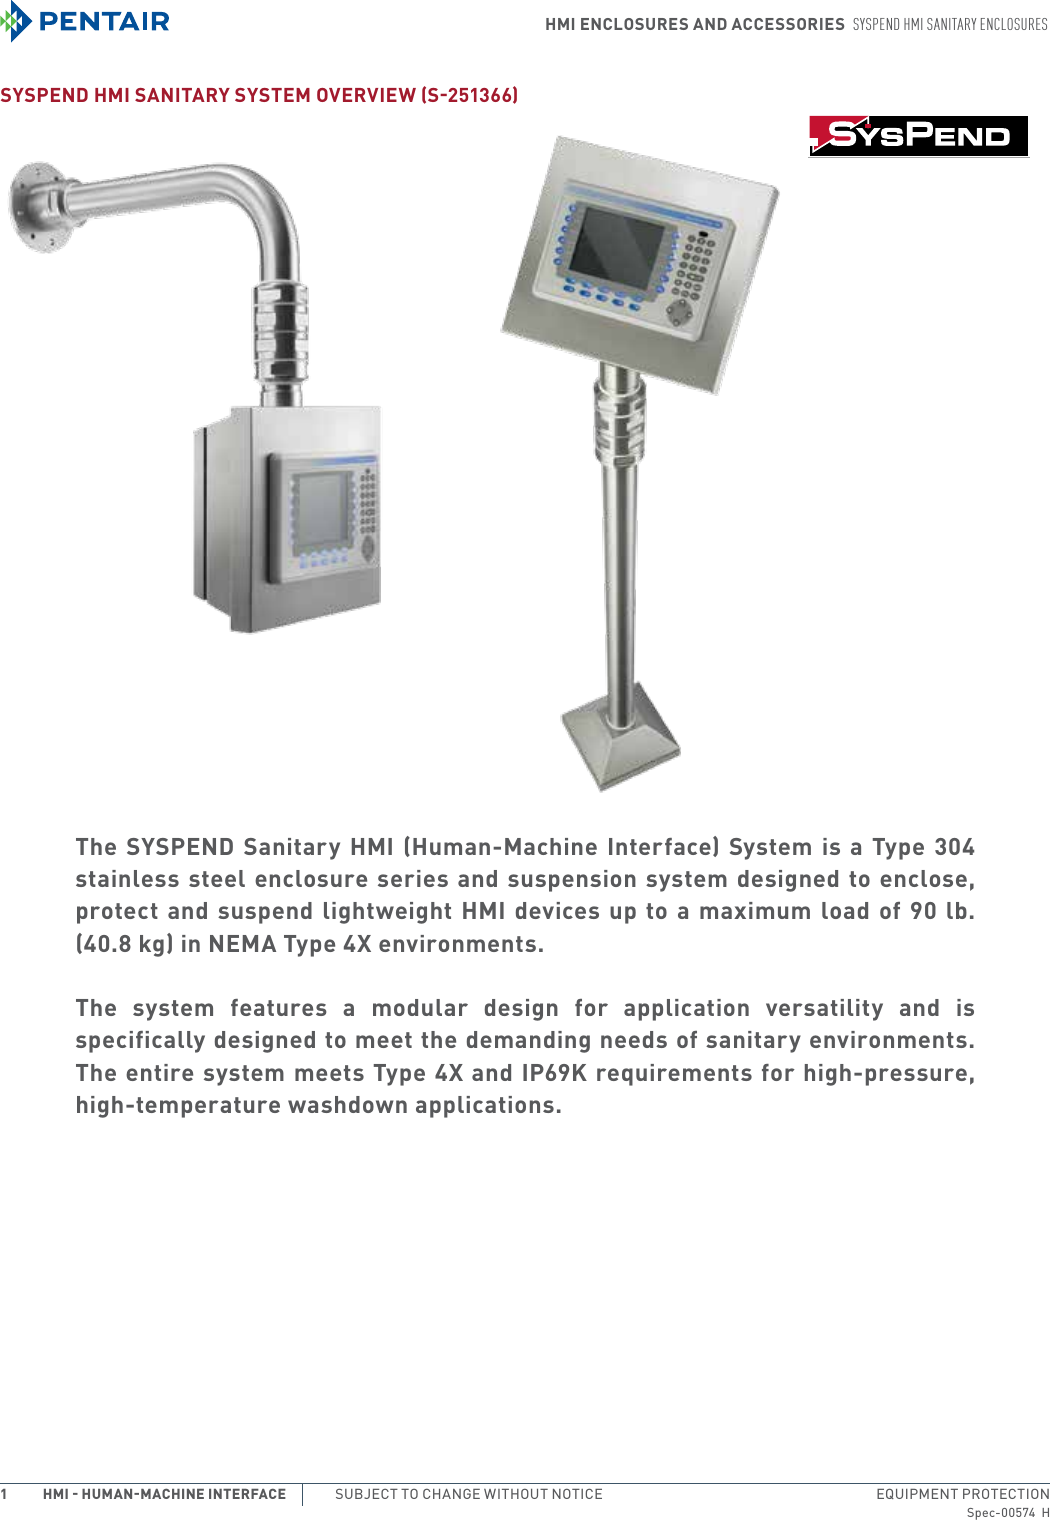 Enclosure Accessory SSBBSS SYSPEND Series SSBBSS Swivel Base Bracket Hoffman SYSPEND HMI Sanitary Enclosures